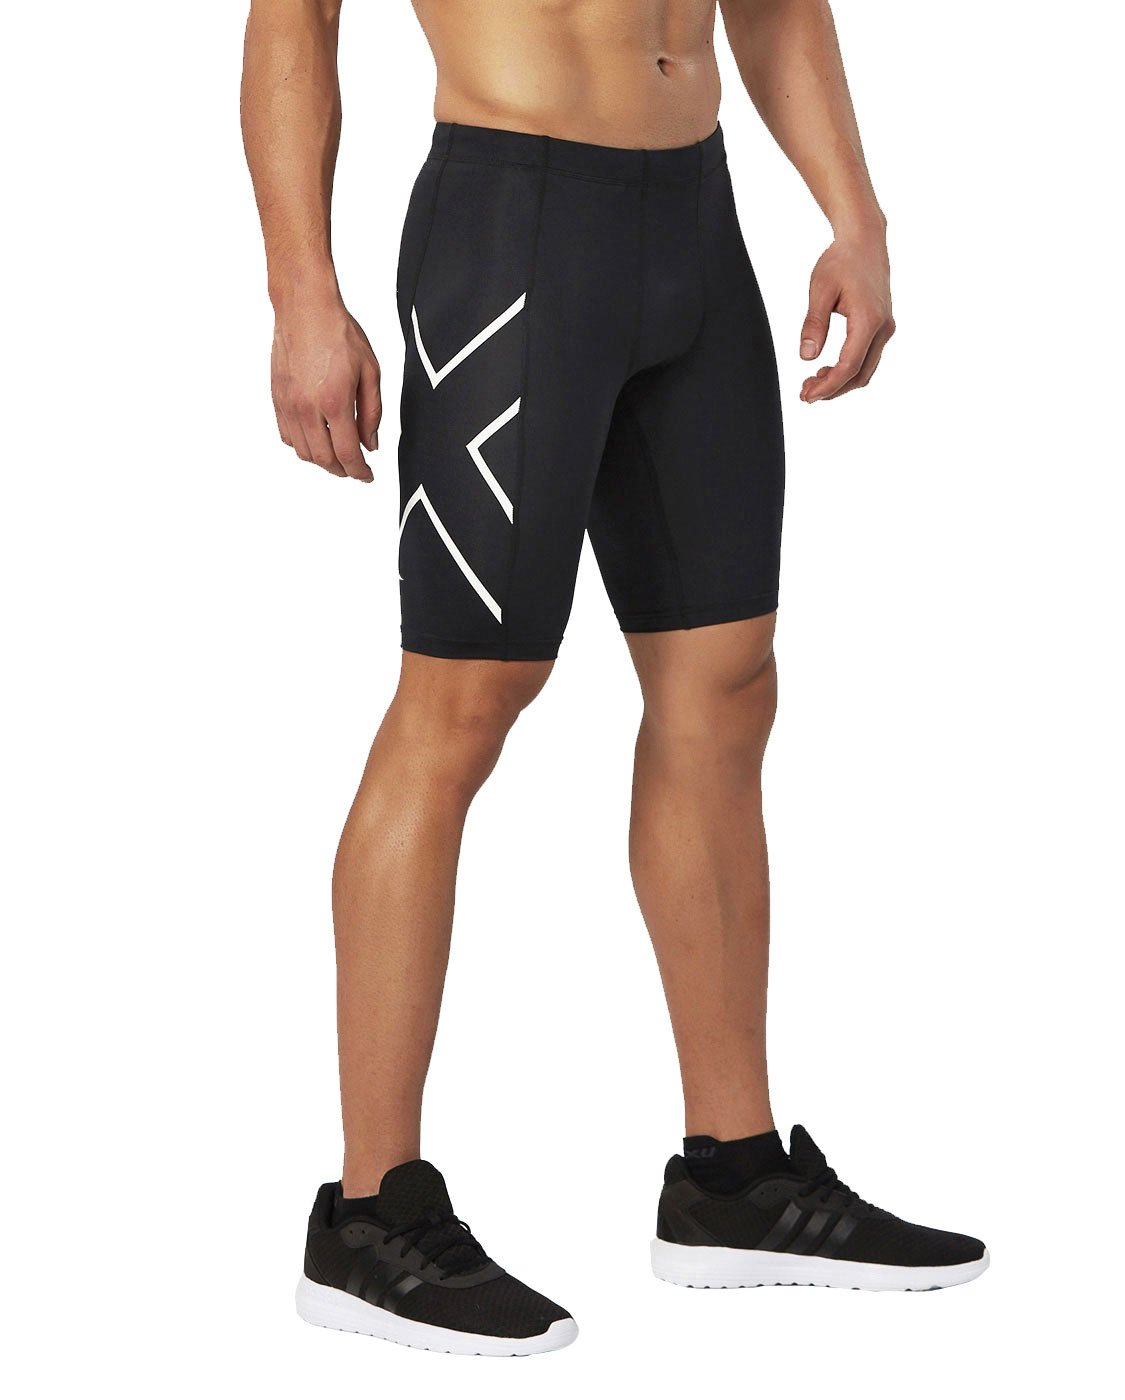 2XU Men's TR 2 Compression Shorts, Black/White, X-Large by 2XU (Image #1)